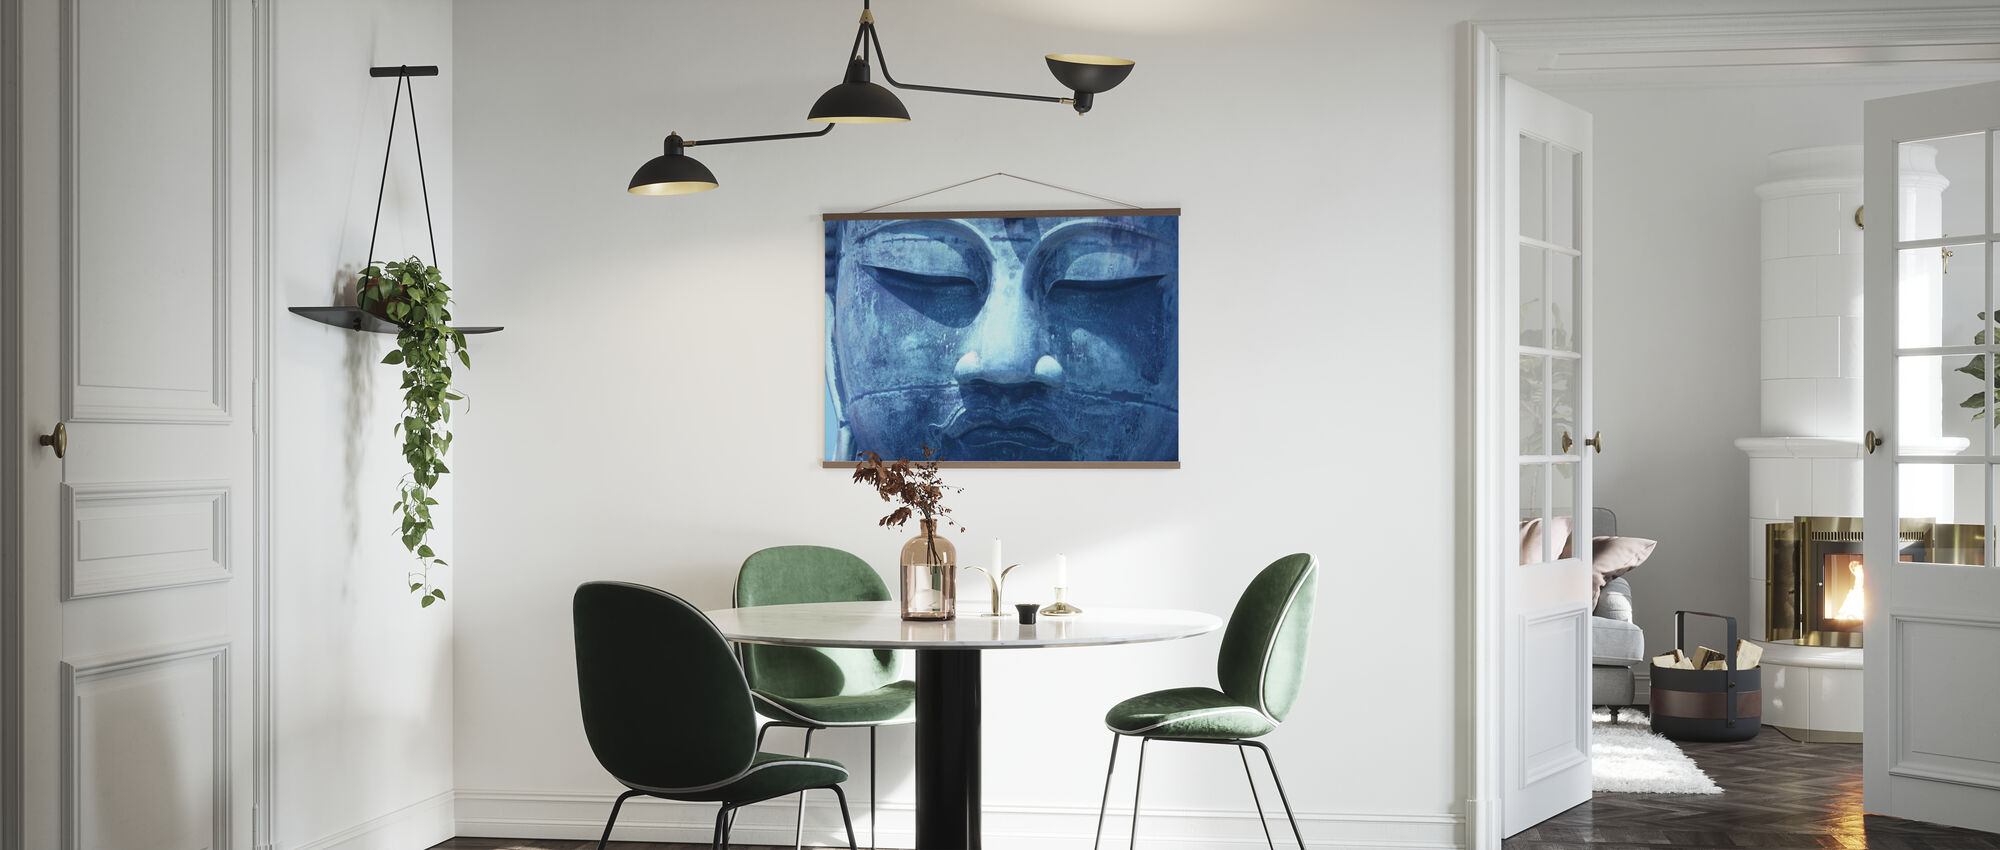 Blue Buddha - Poster - Kitchen